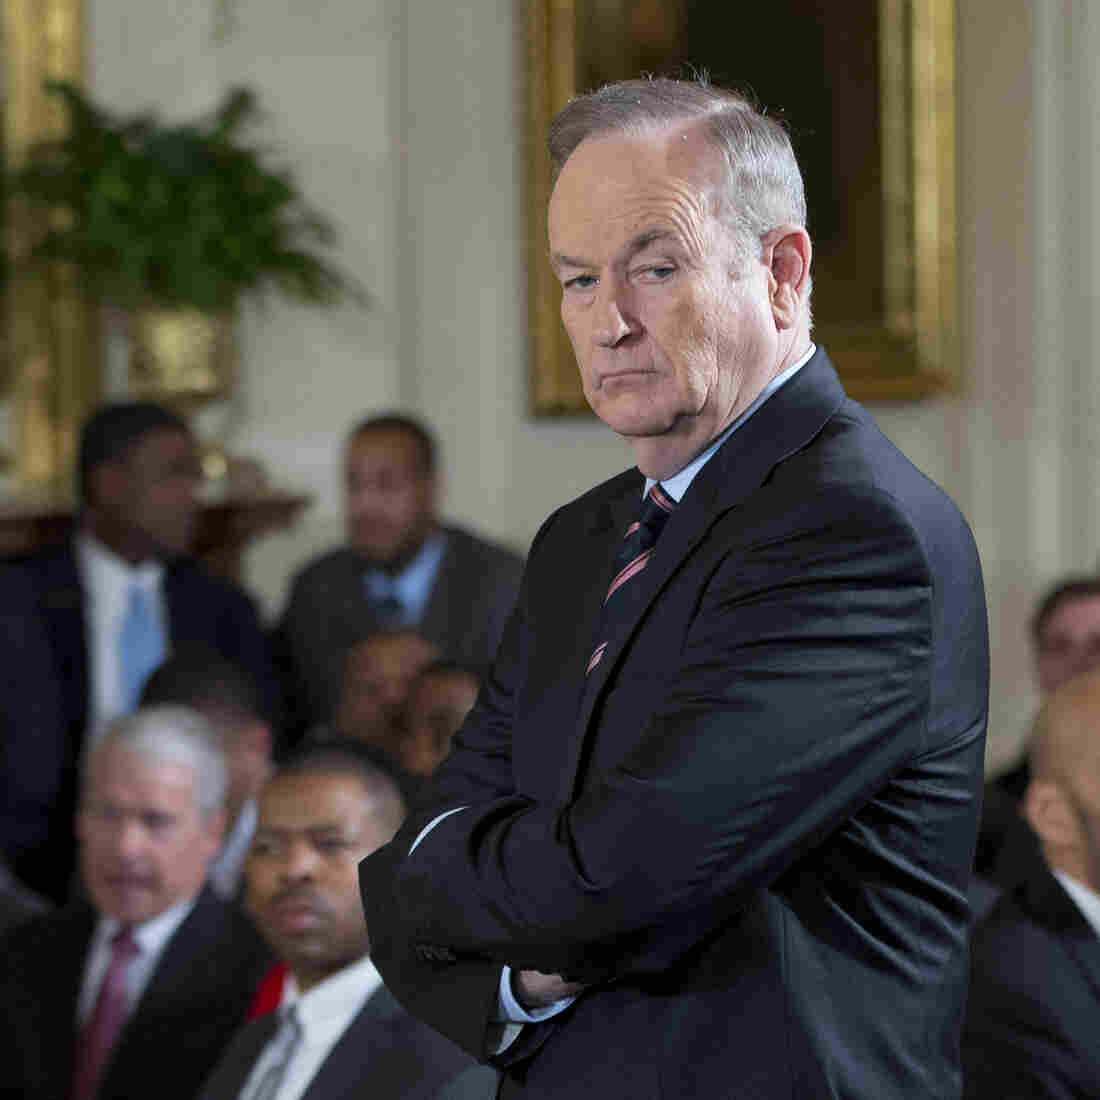 Despite Furious Objections, Bill O'Reilly's War Claims Warrant Scrutiny